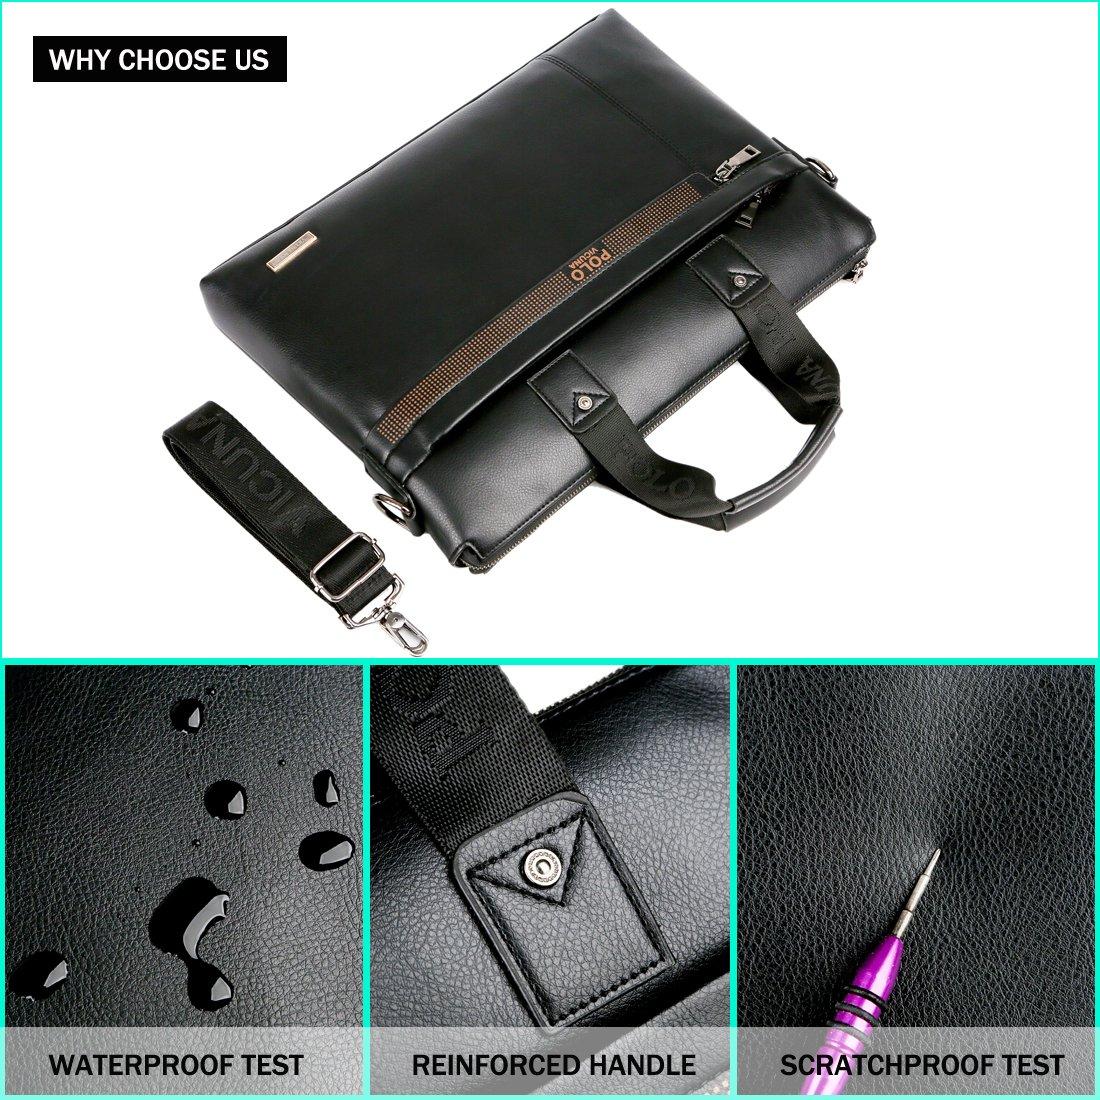 VICUNA POLO Men Briefcase Bag Business Bag Leather Laptop Bag Man Bag Handbag (black for 15.6inch) by VICUNA POLO (Image #6)